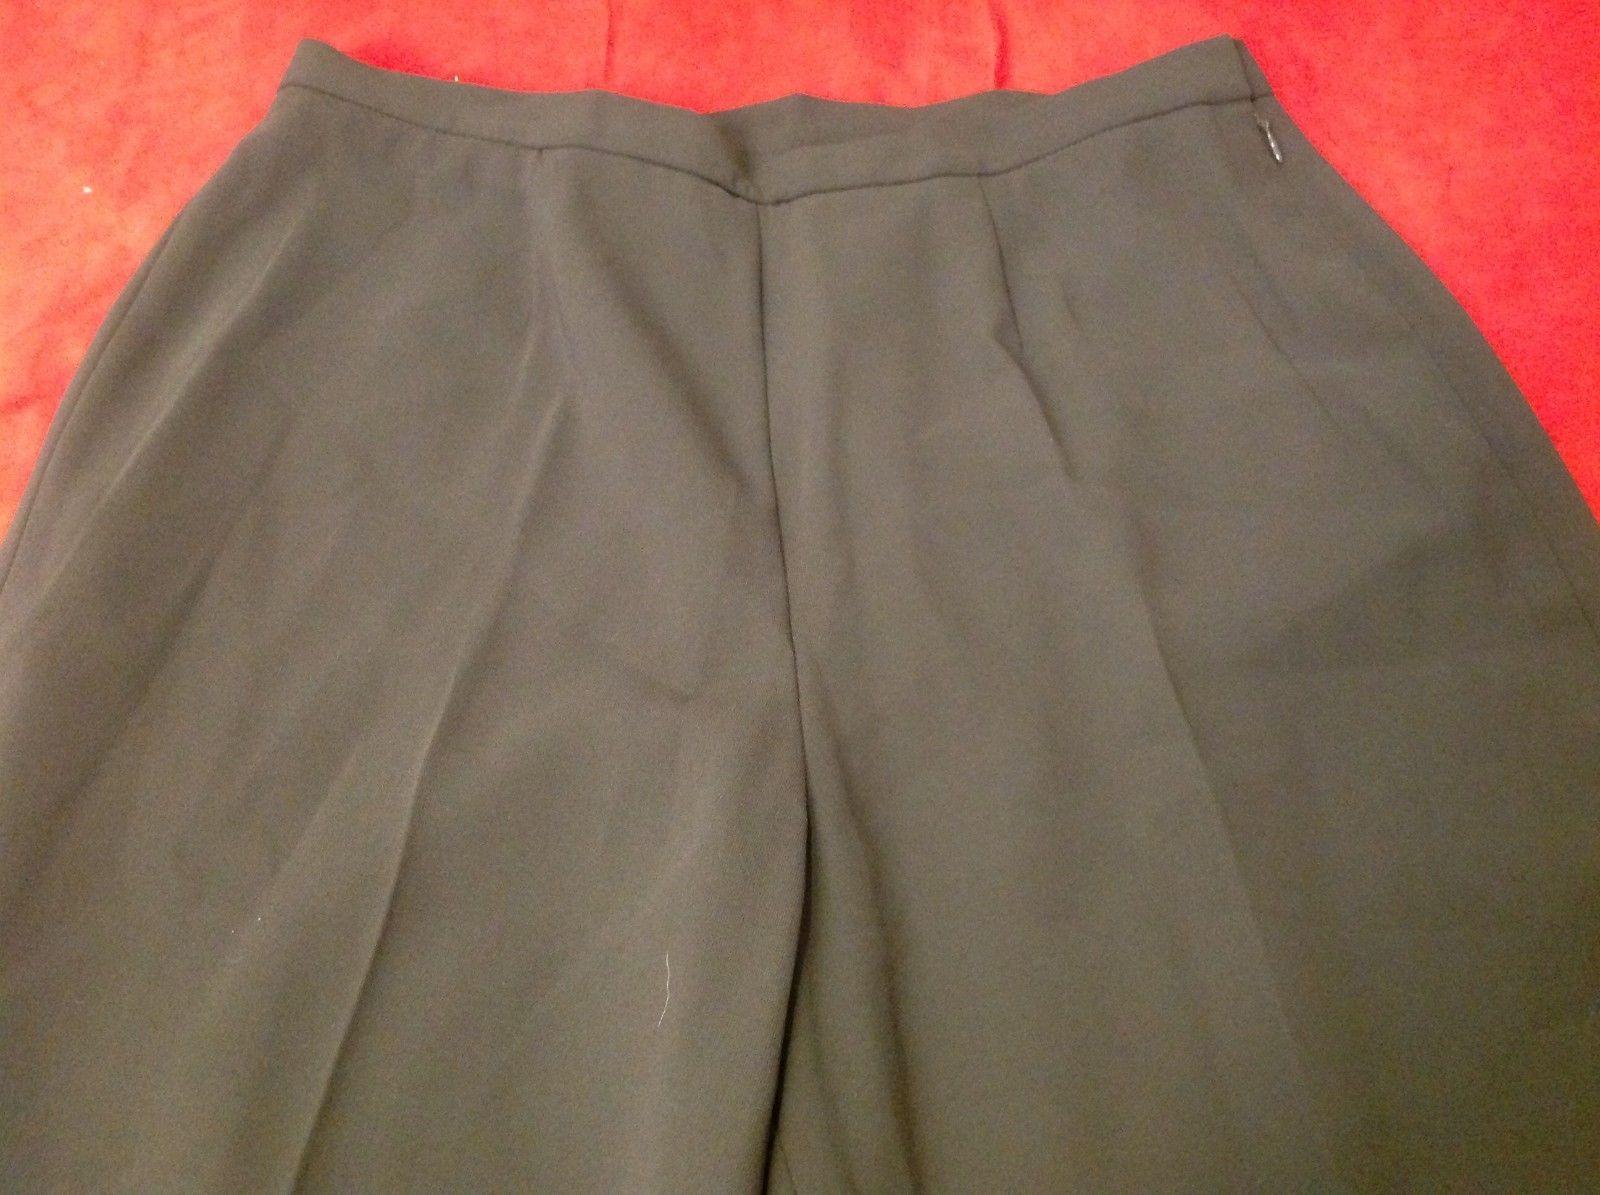 kasper classics brown casual pants women's size 8